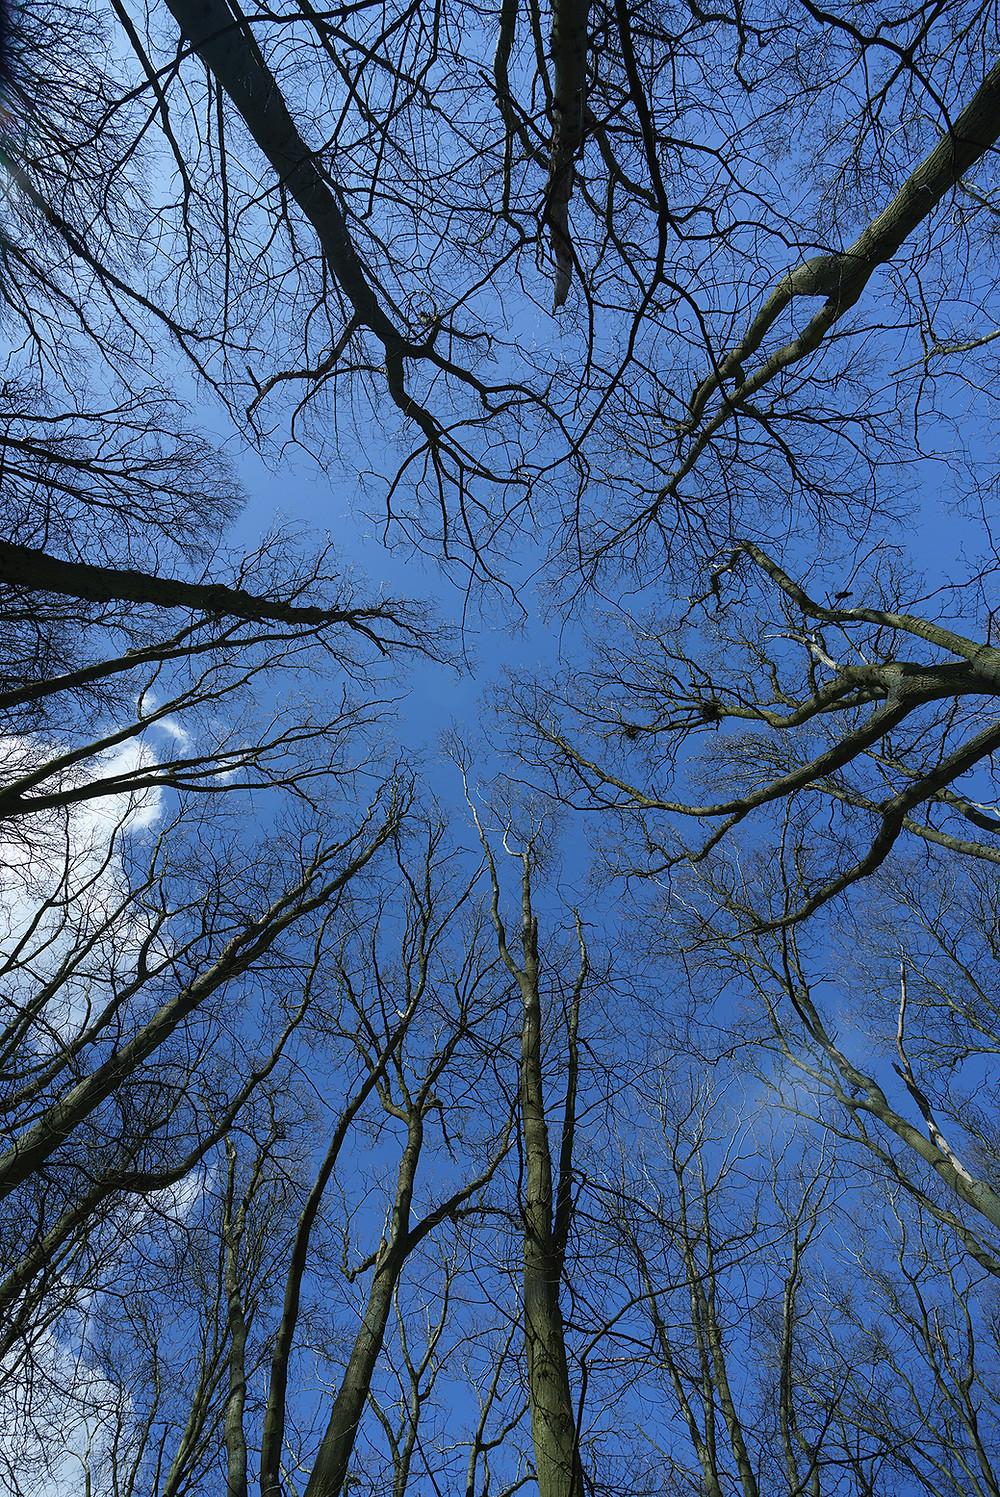 Crow's Nests at Tercentenary Plantation